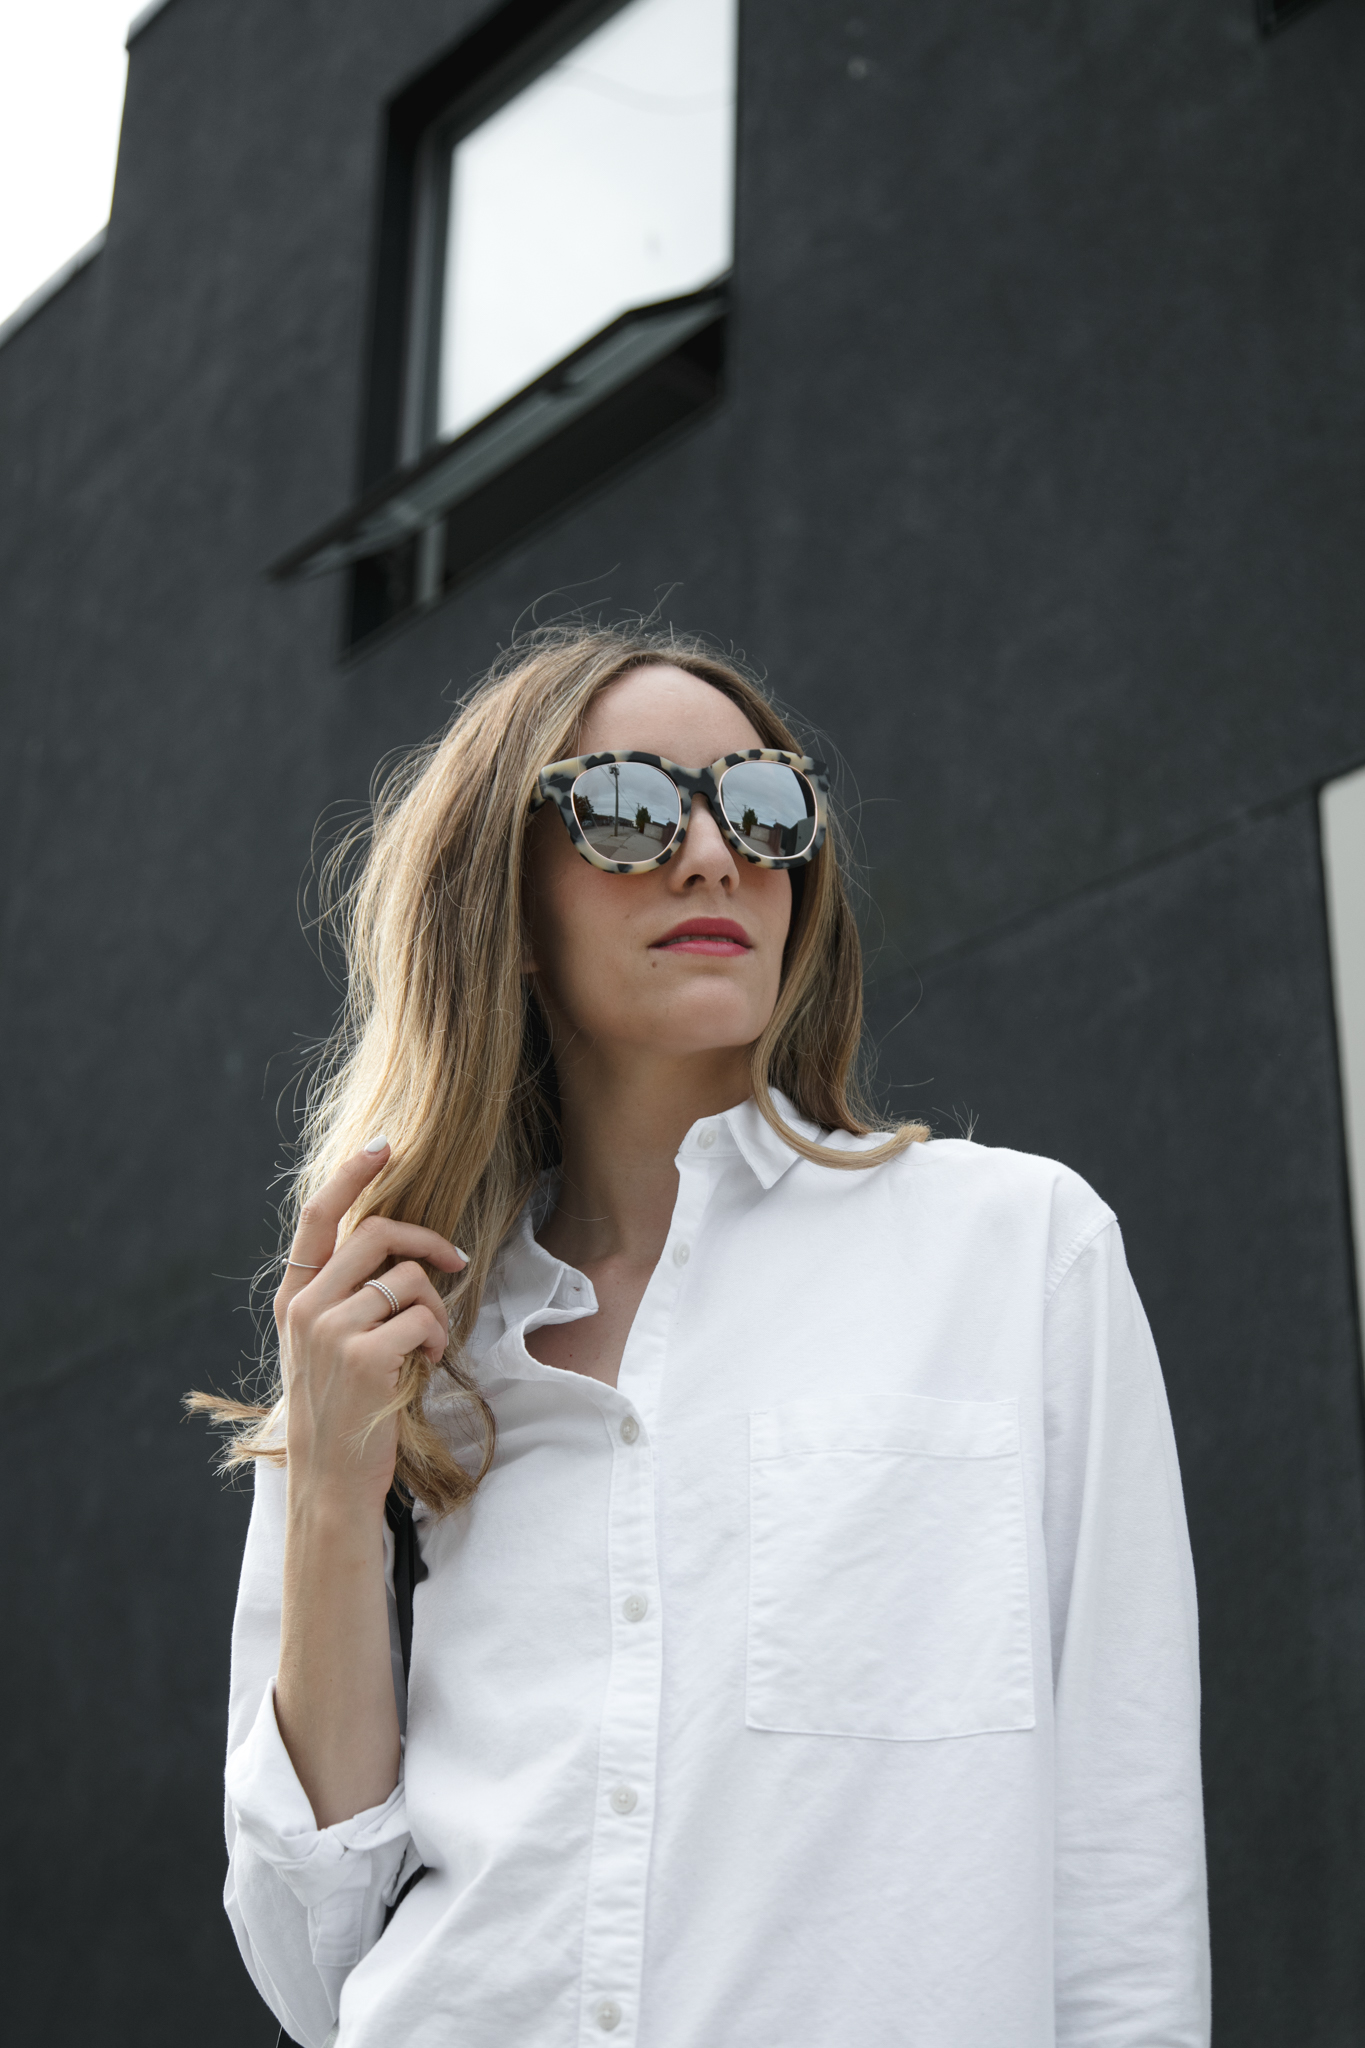 sharday-engel-frank-oak-shirt-fifth-sunglasses-helmut-lang-jeans5955.jpg